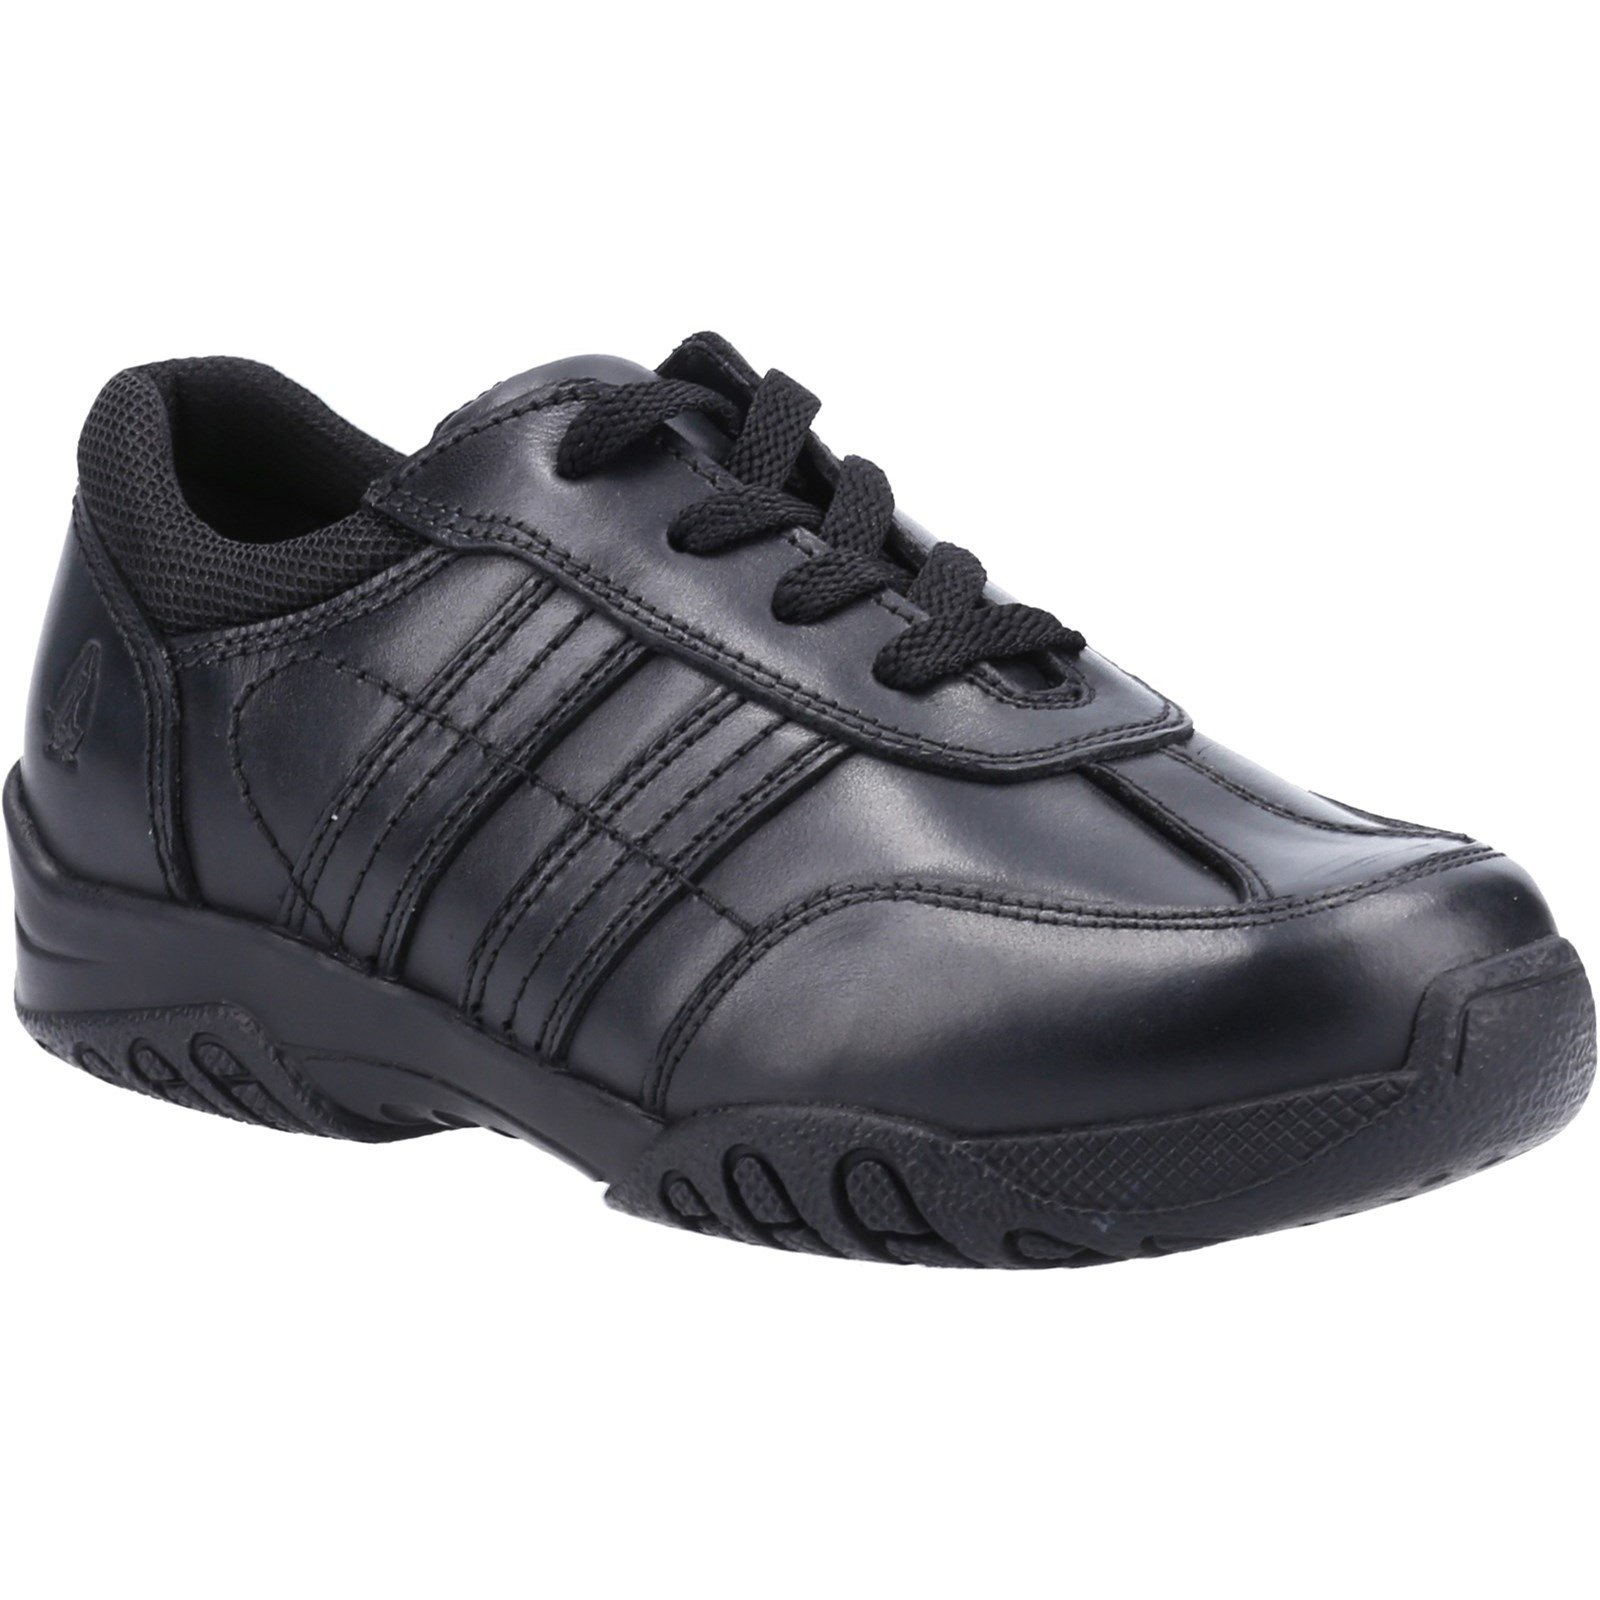 Hush Puppies Kid's Jezza2 Junior School Shoe Black 32606 - Black 13